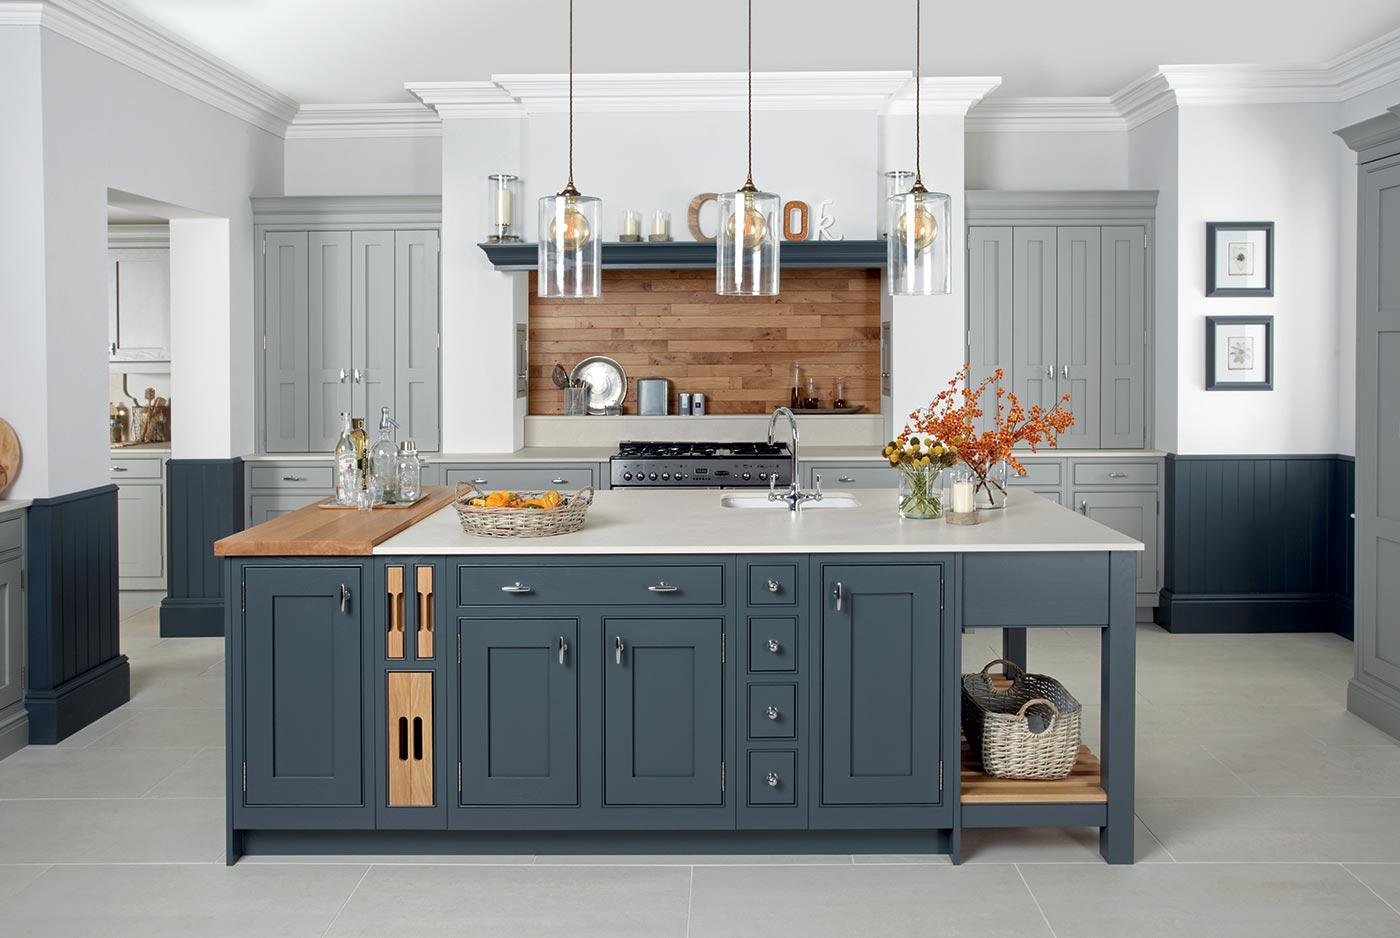 Katrine Painted Elgin Grey & Caithness Slate Caledonia Traditional Shaker Style Kitchen